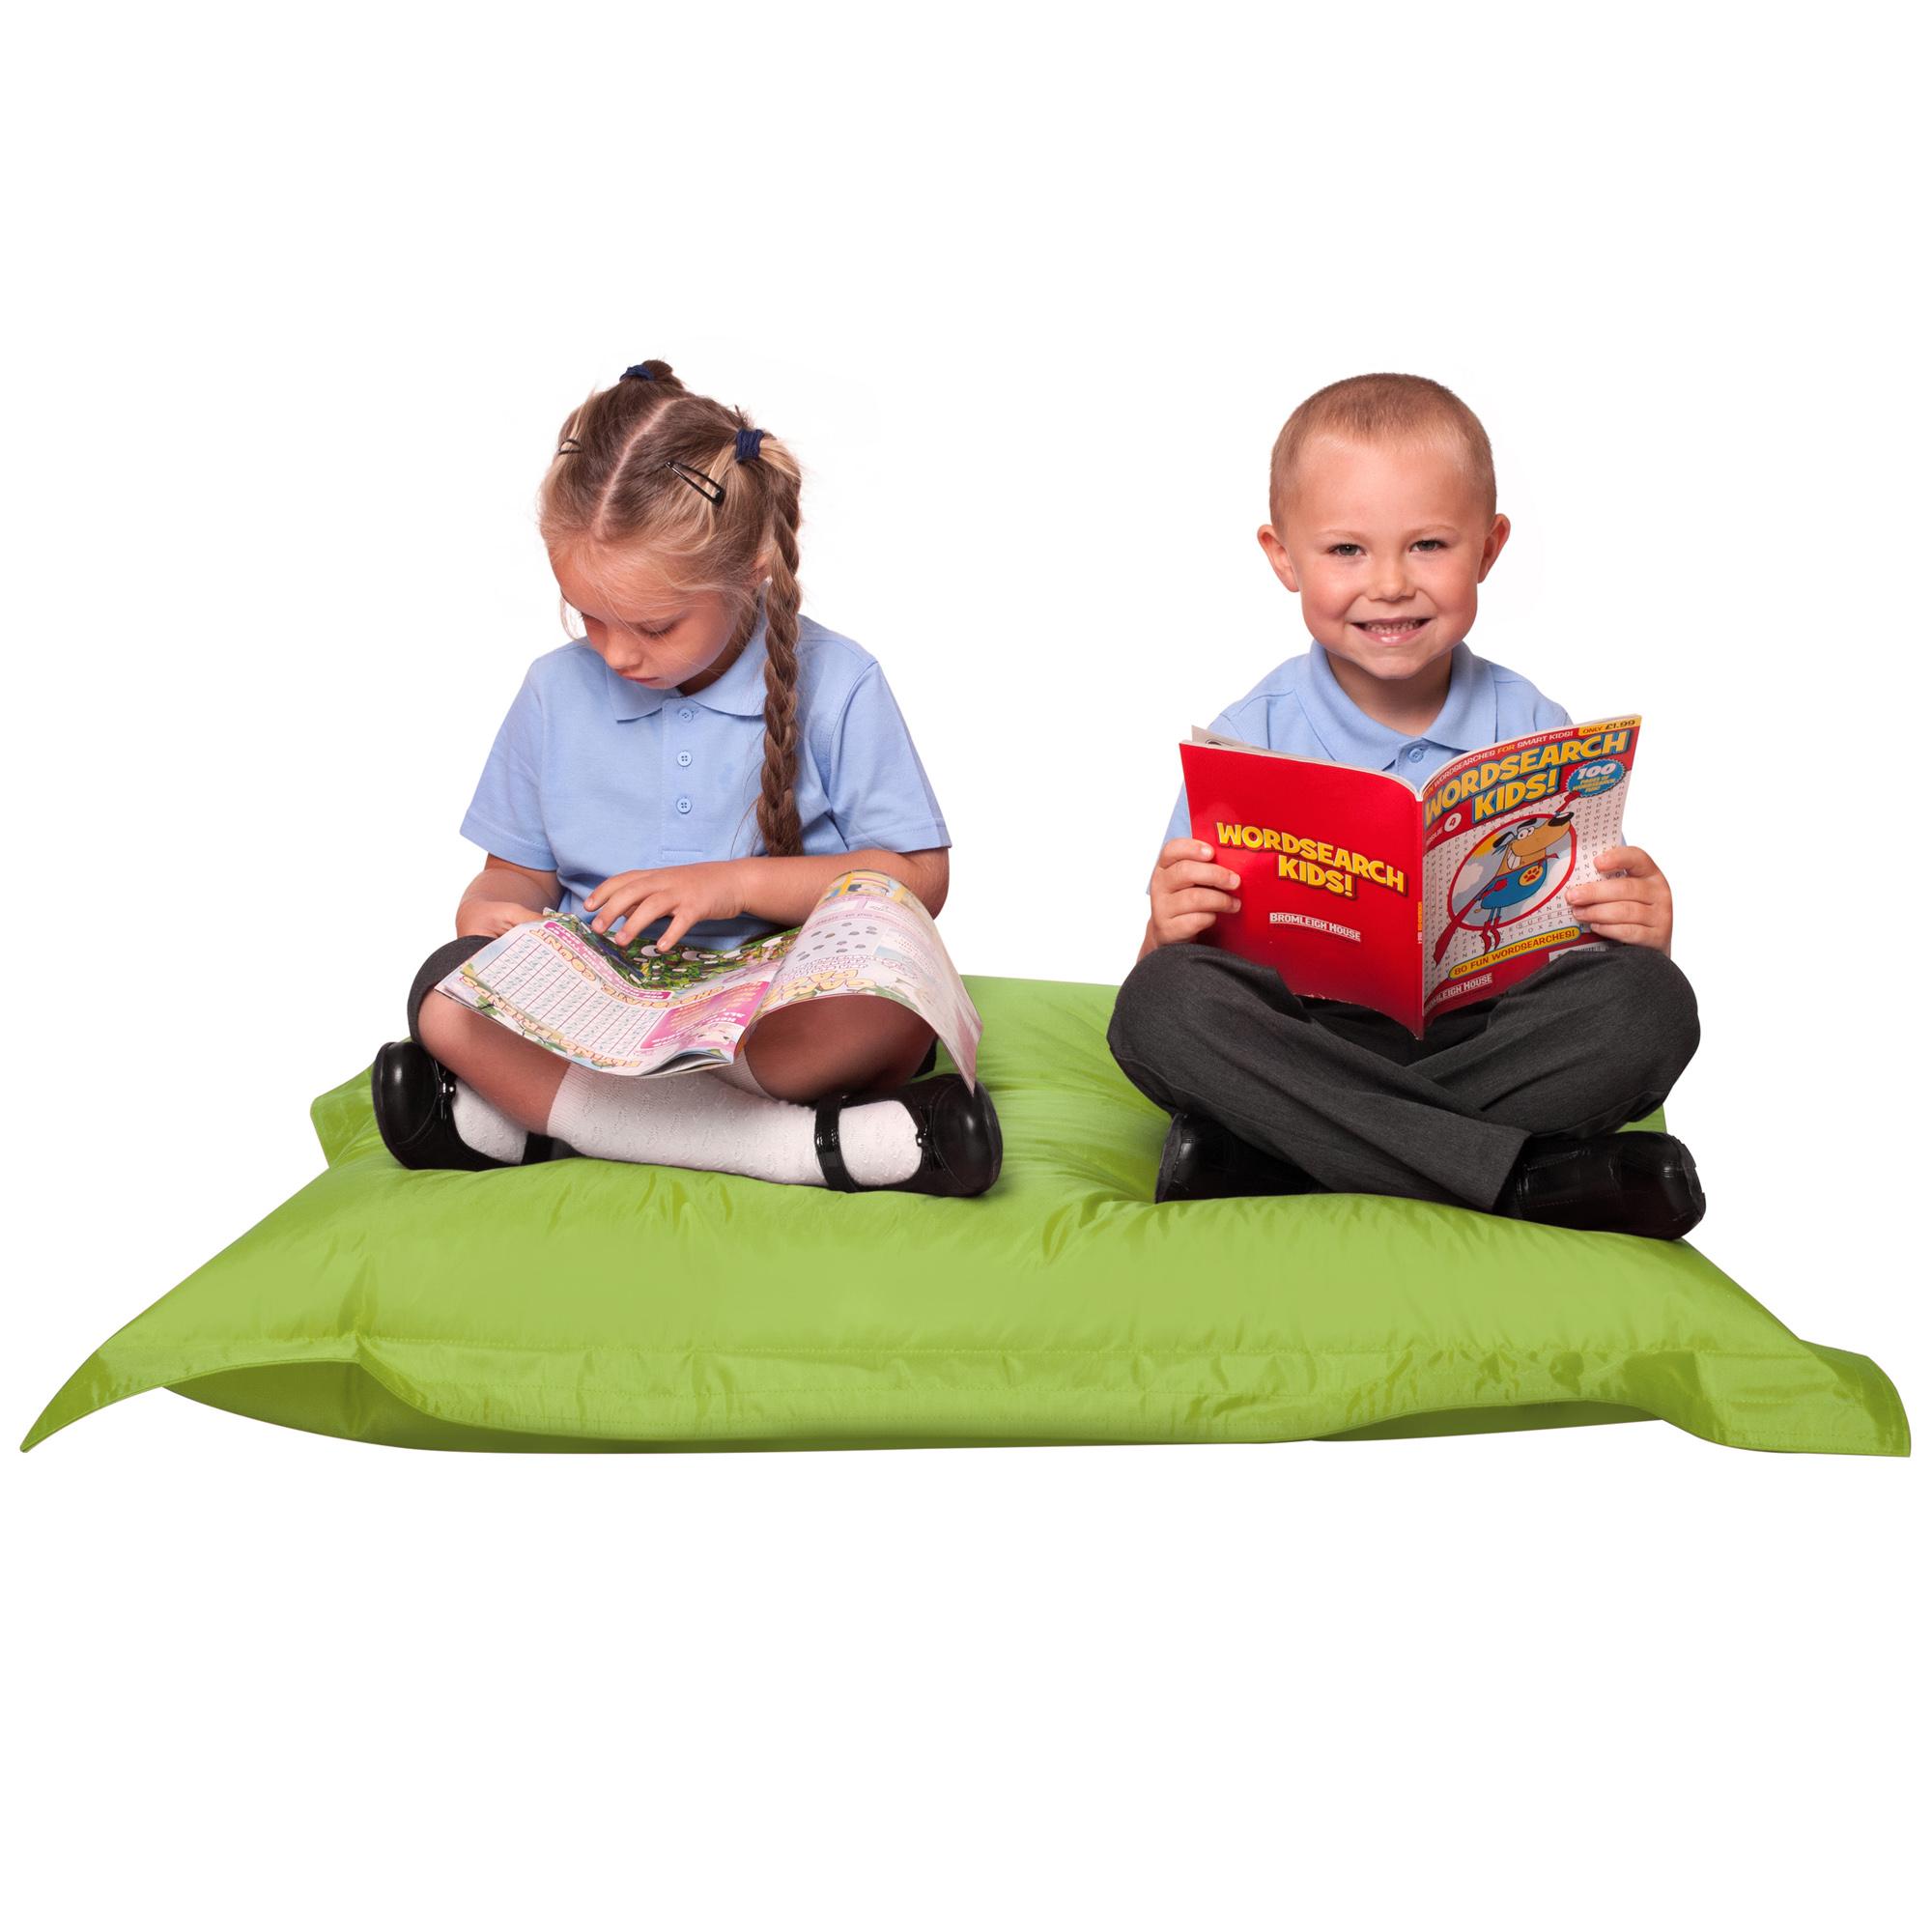 Eden-Childrens-Giant-Cushion-lime-300dpi